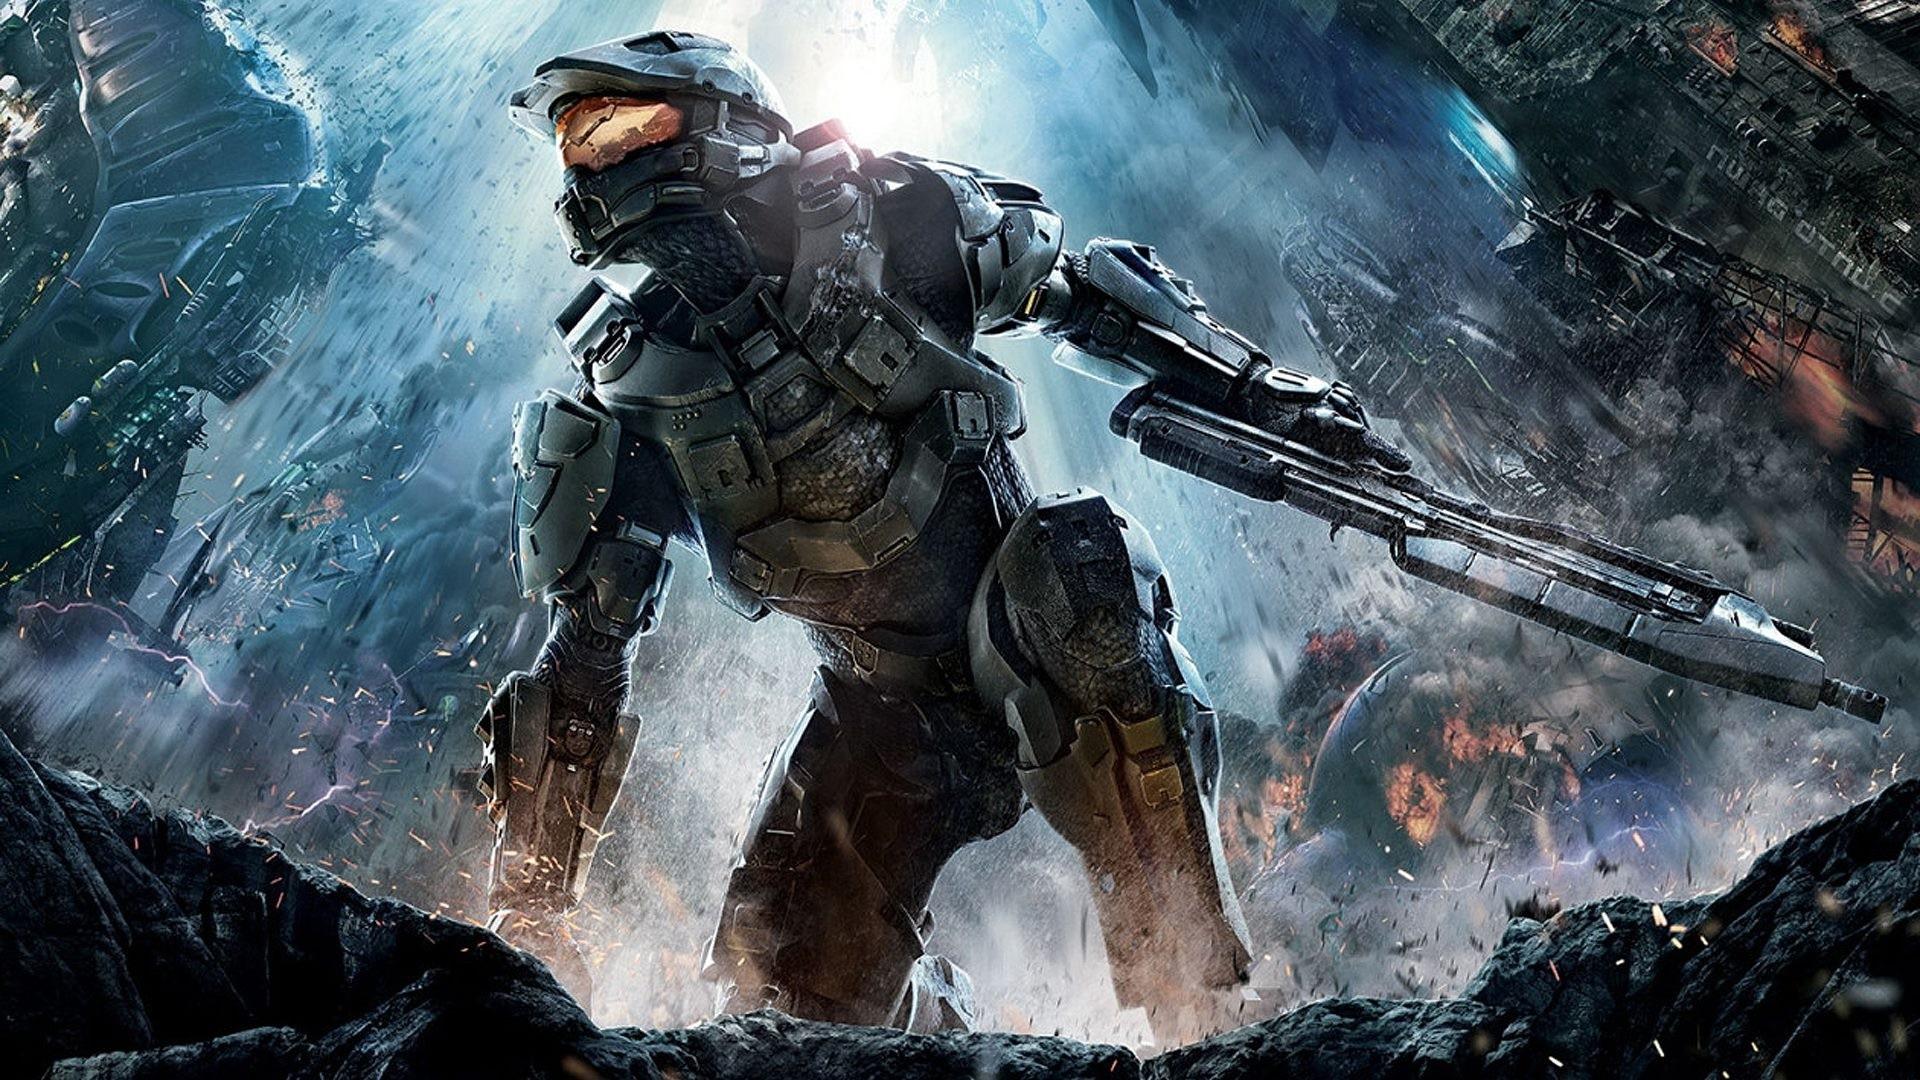 Halo 4 wallpaper 4018 1920x1080